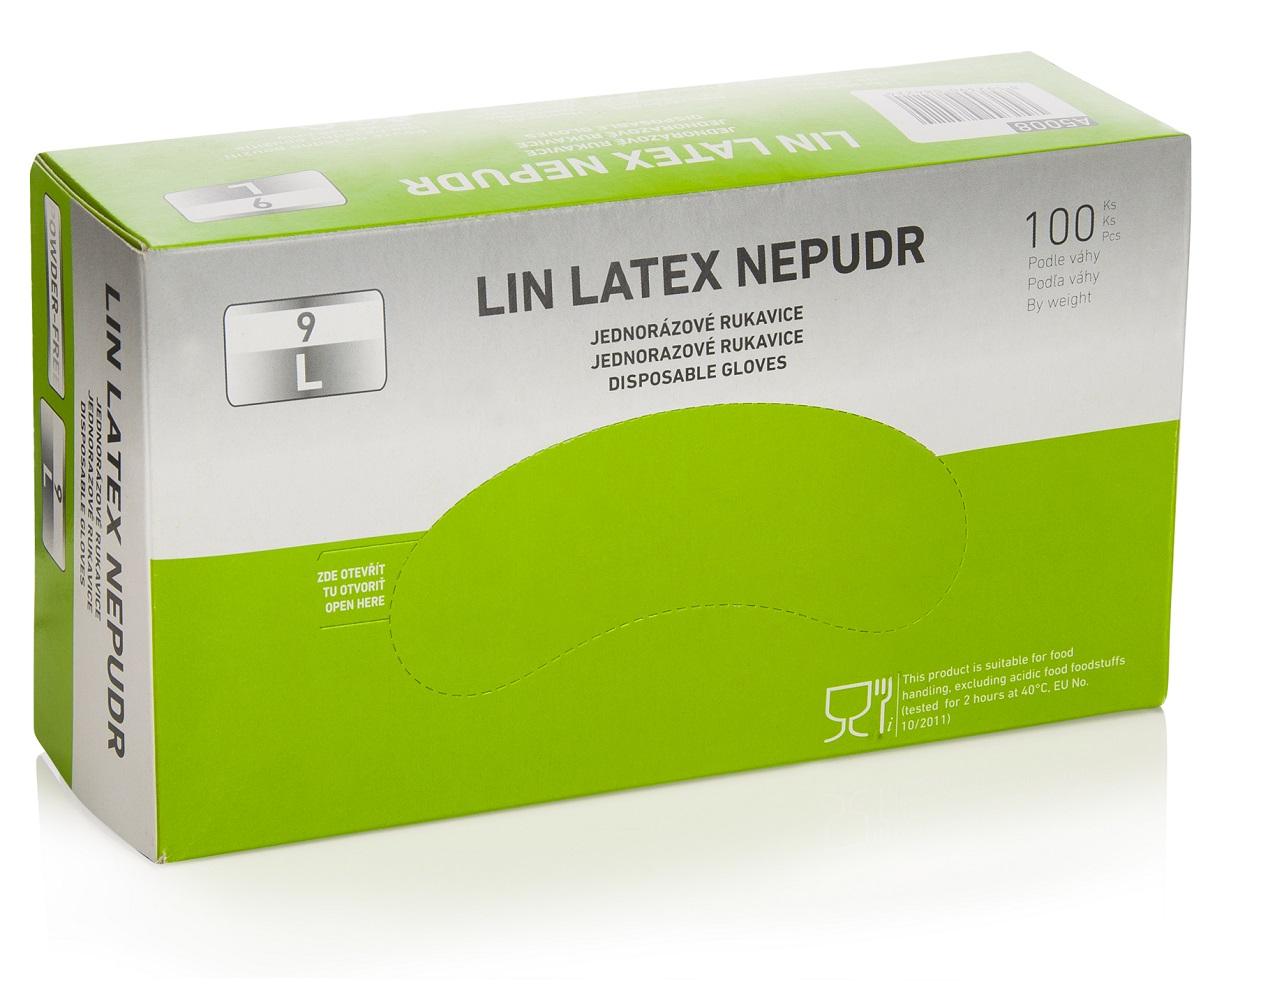 Rukavice LIN LATEX NEPUDR S 07